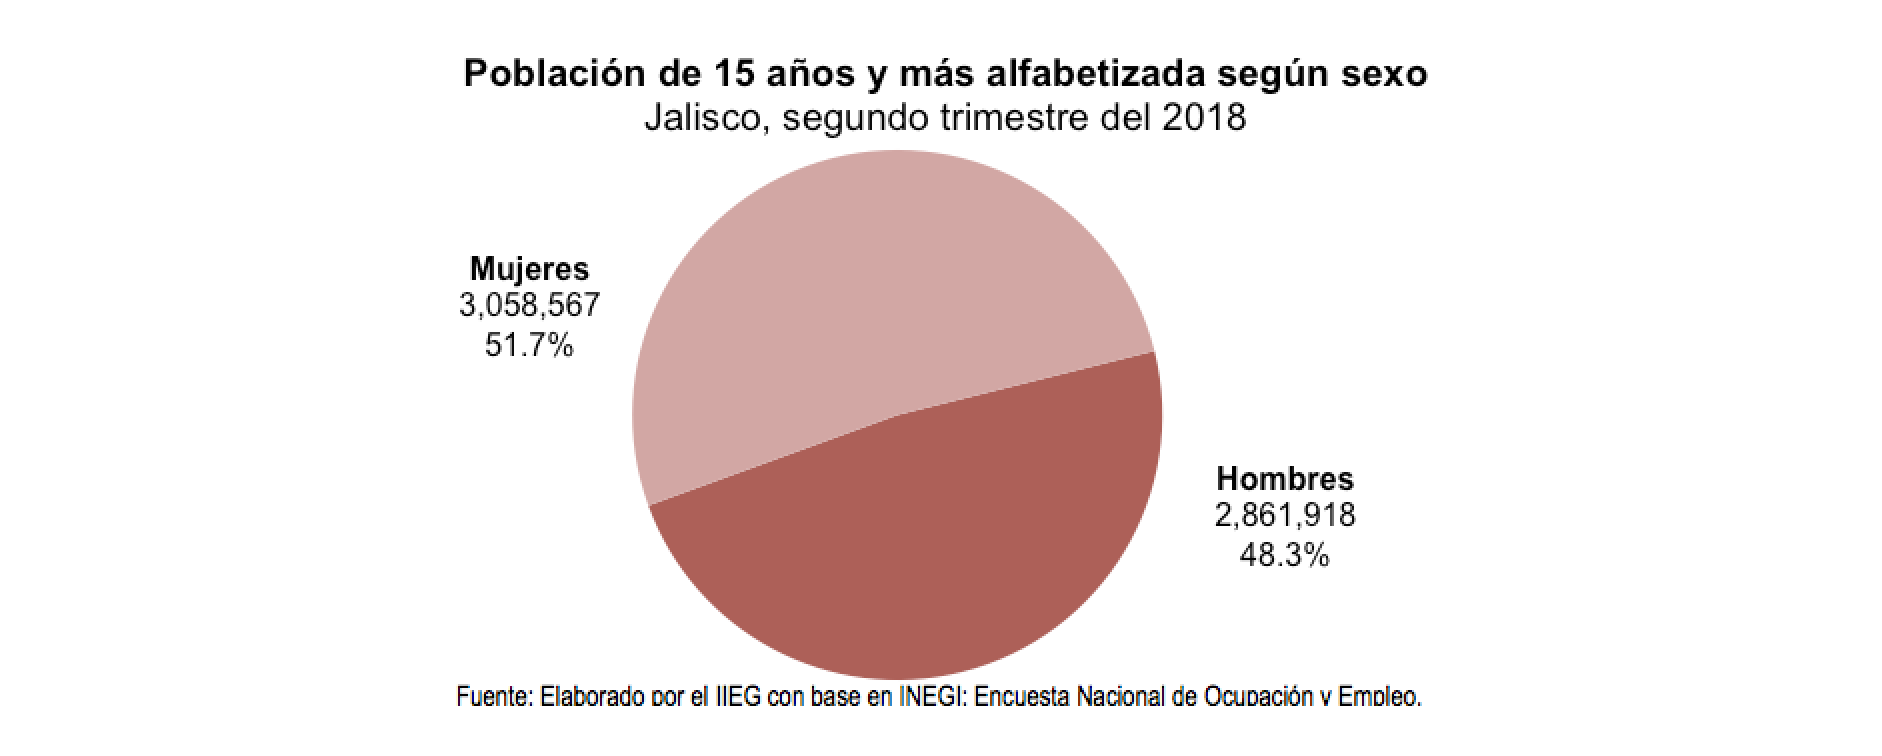 1-alfabetizacion-jalisco-2018-sexo